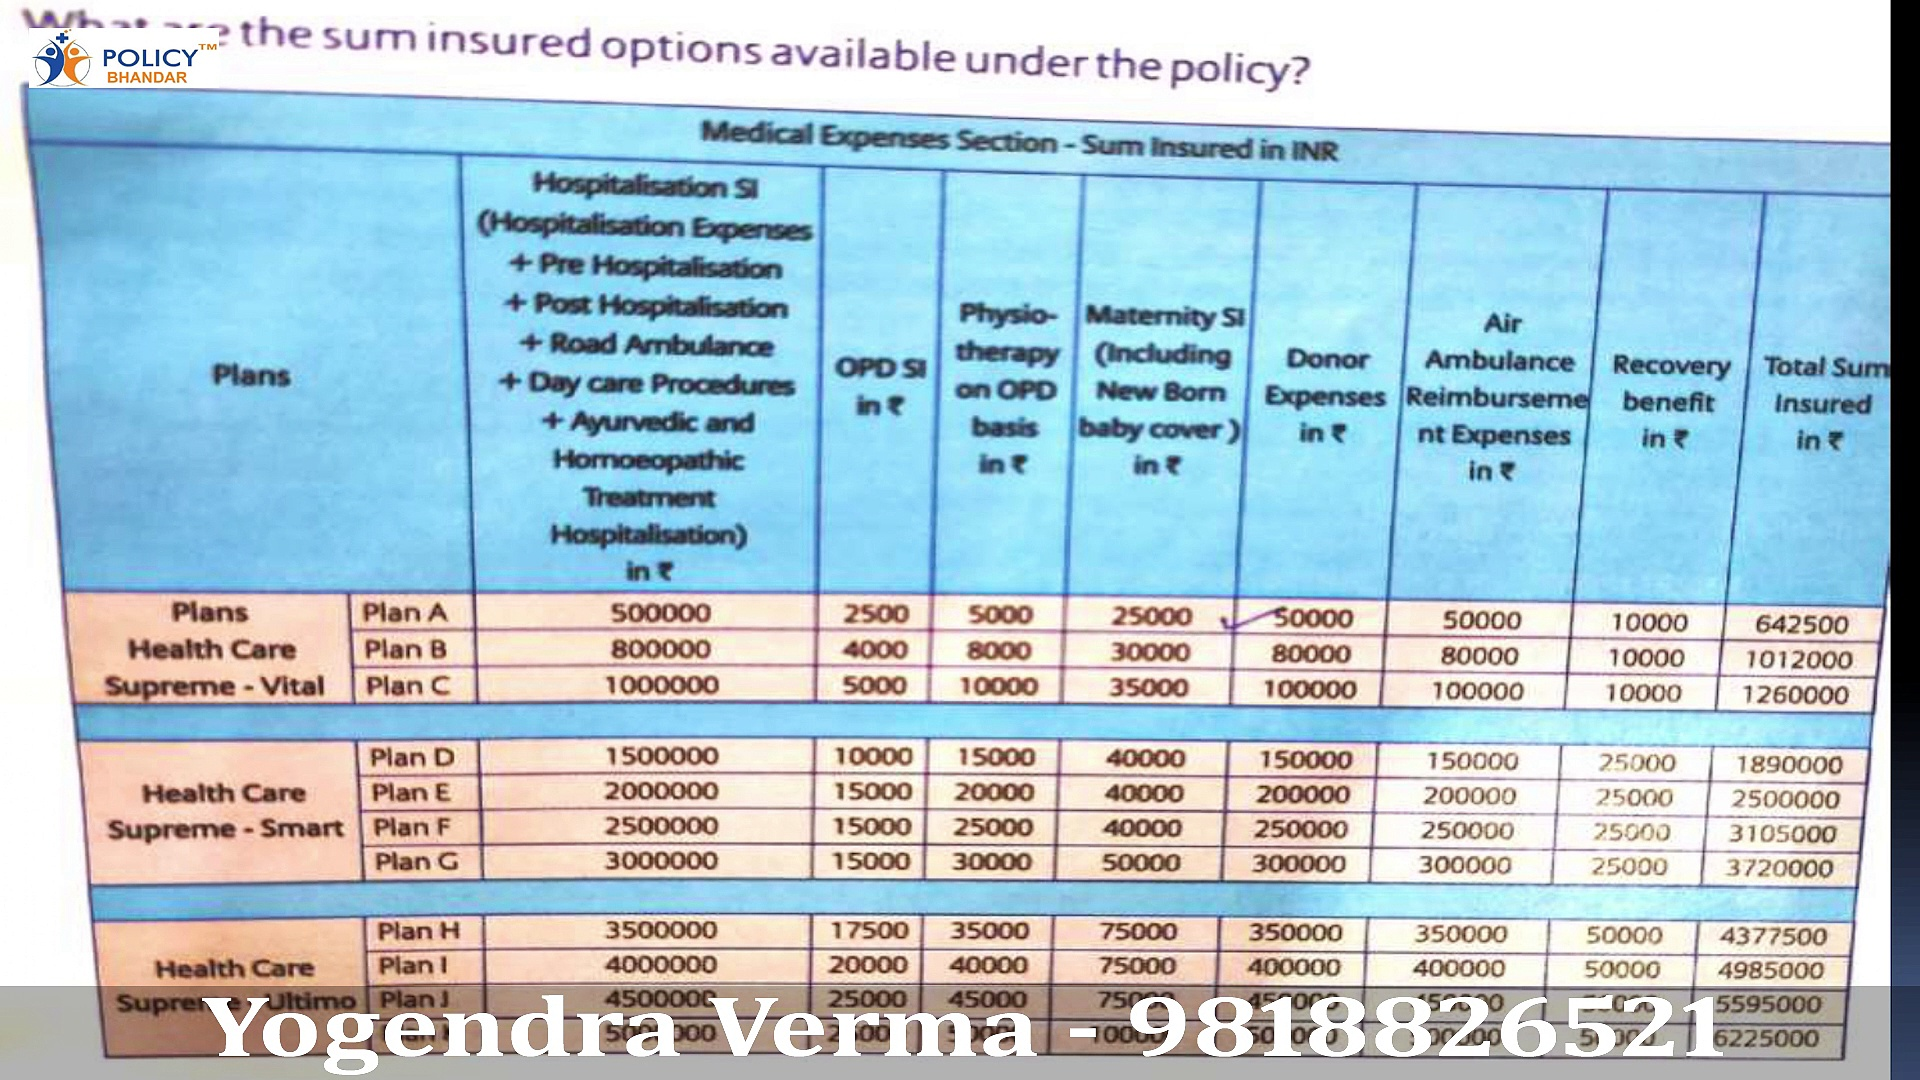 Bajaj Health Care Bajaj Health Care Supreme | Latest Updates 2020 | Health Insurance | Mediclaim | Policy Bhandar